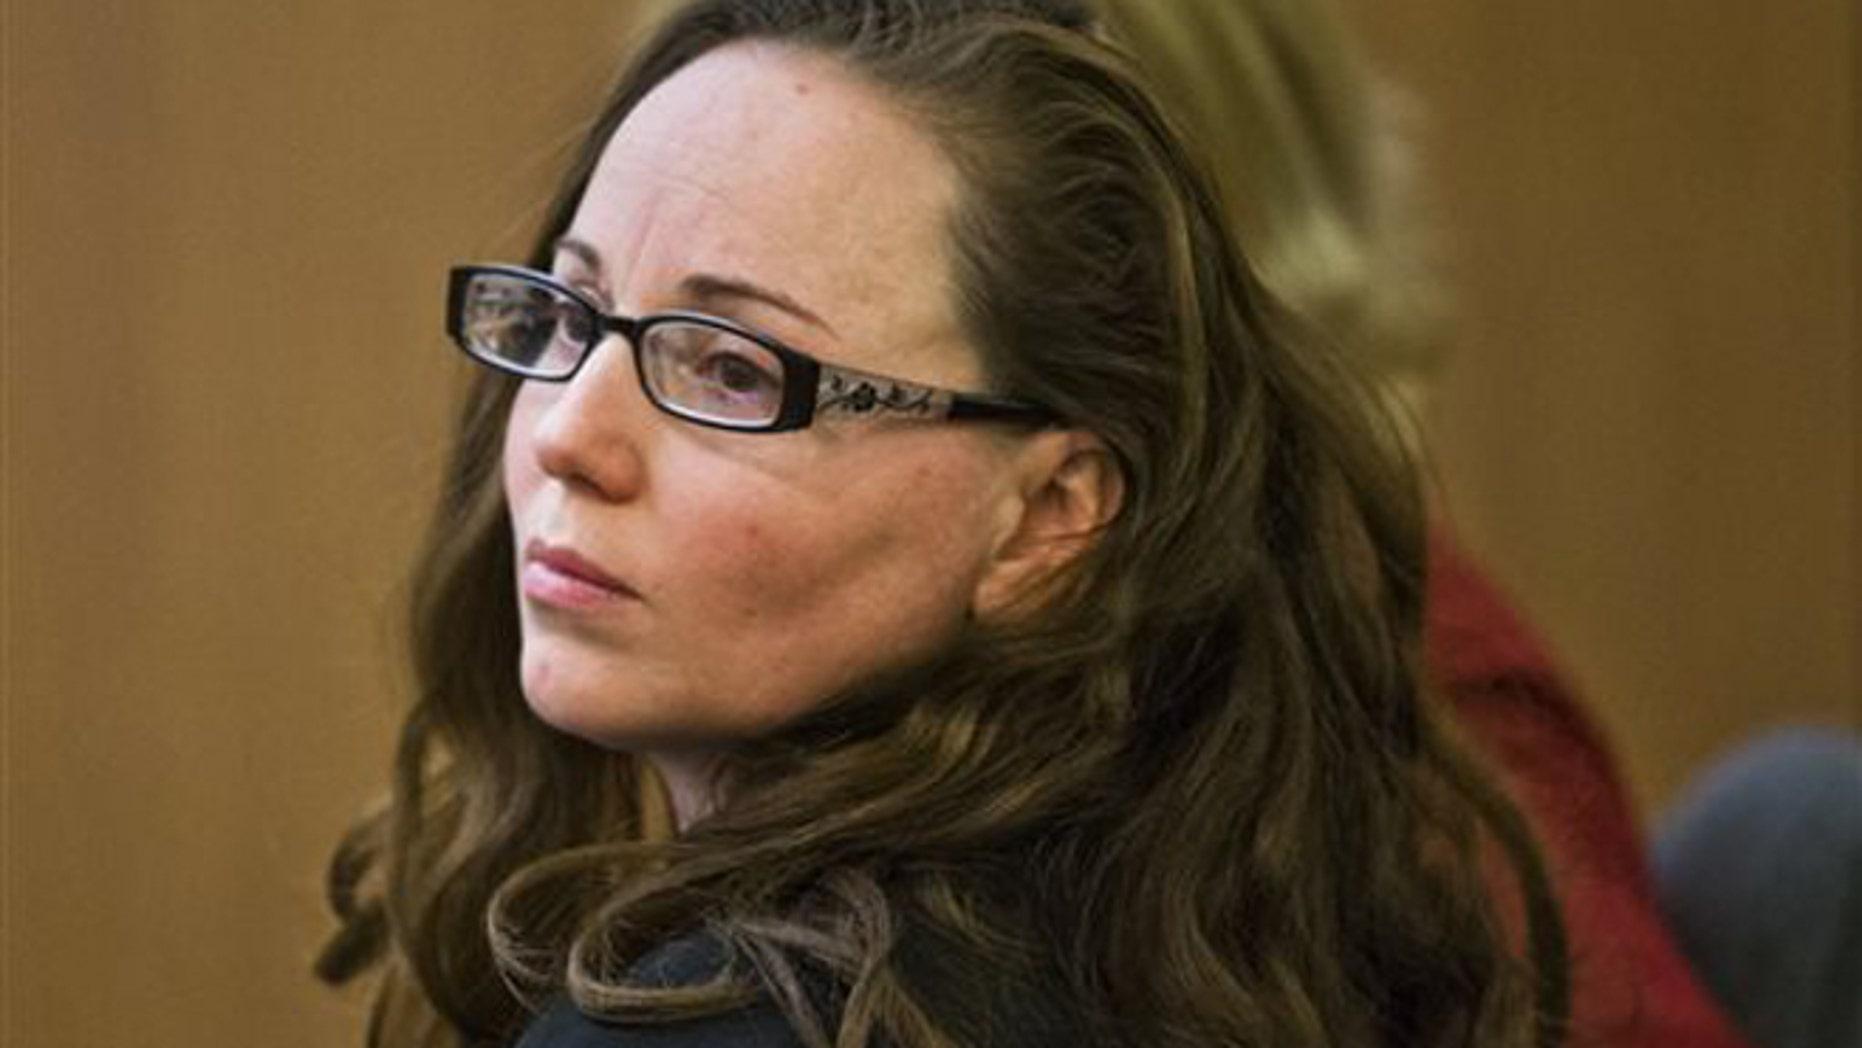 Marissa Devault in Maricopa County Superior Court, Tuesday, April 8, 2014, in Phoenix.